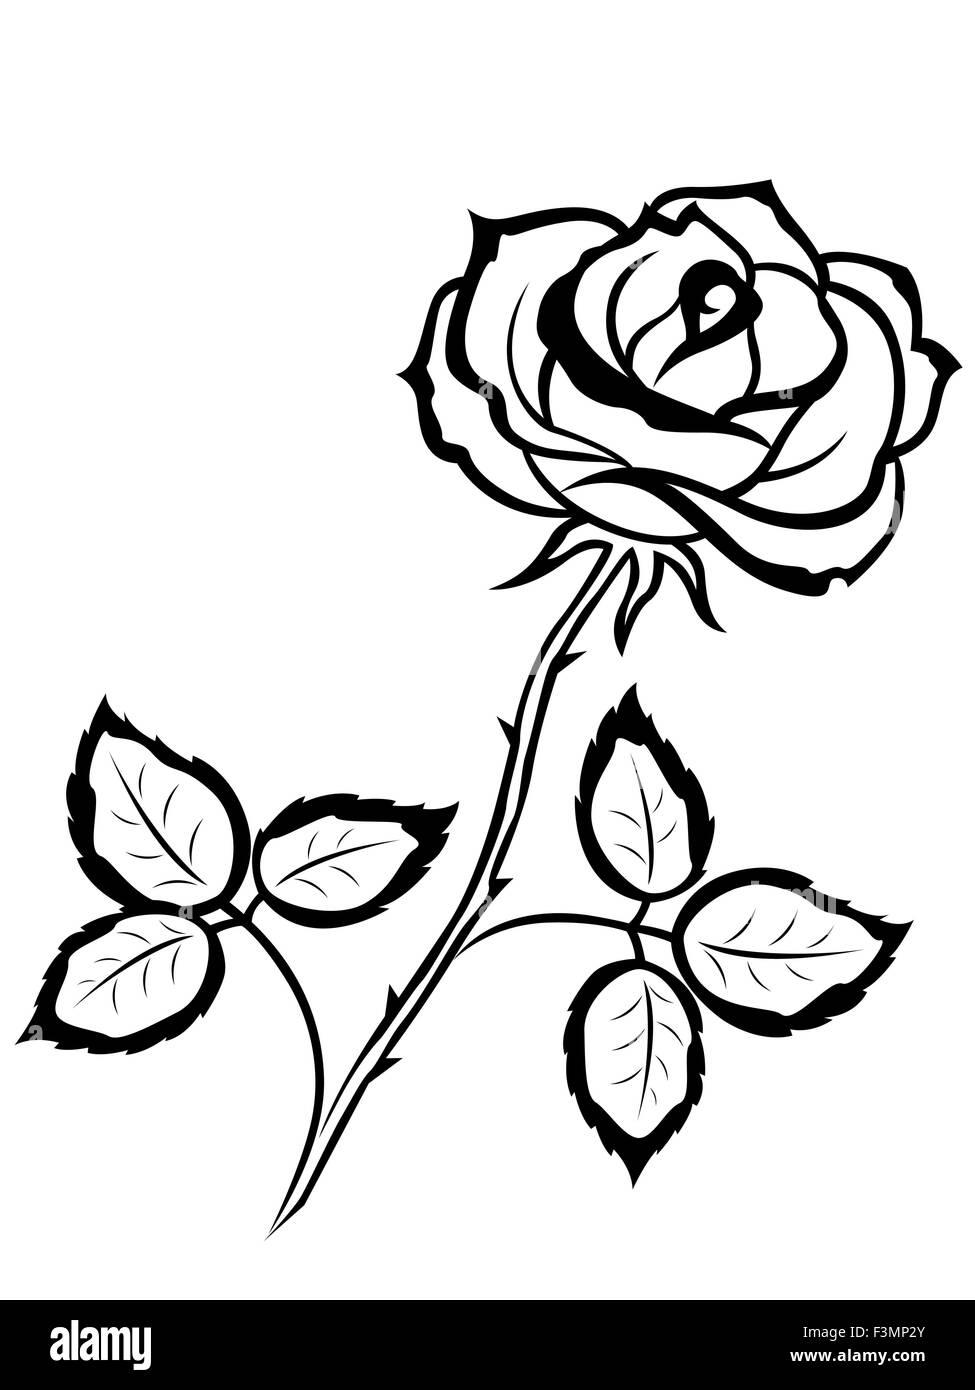 Black Vector Outline Rose Flower Black And White Stock Photos